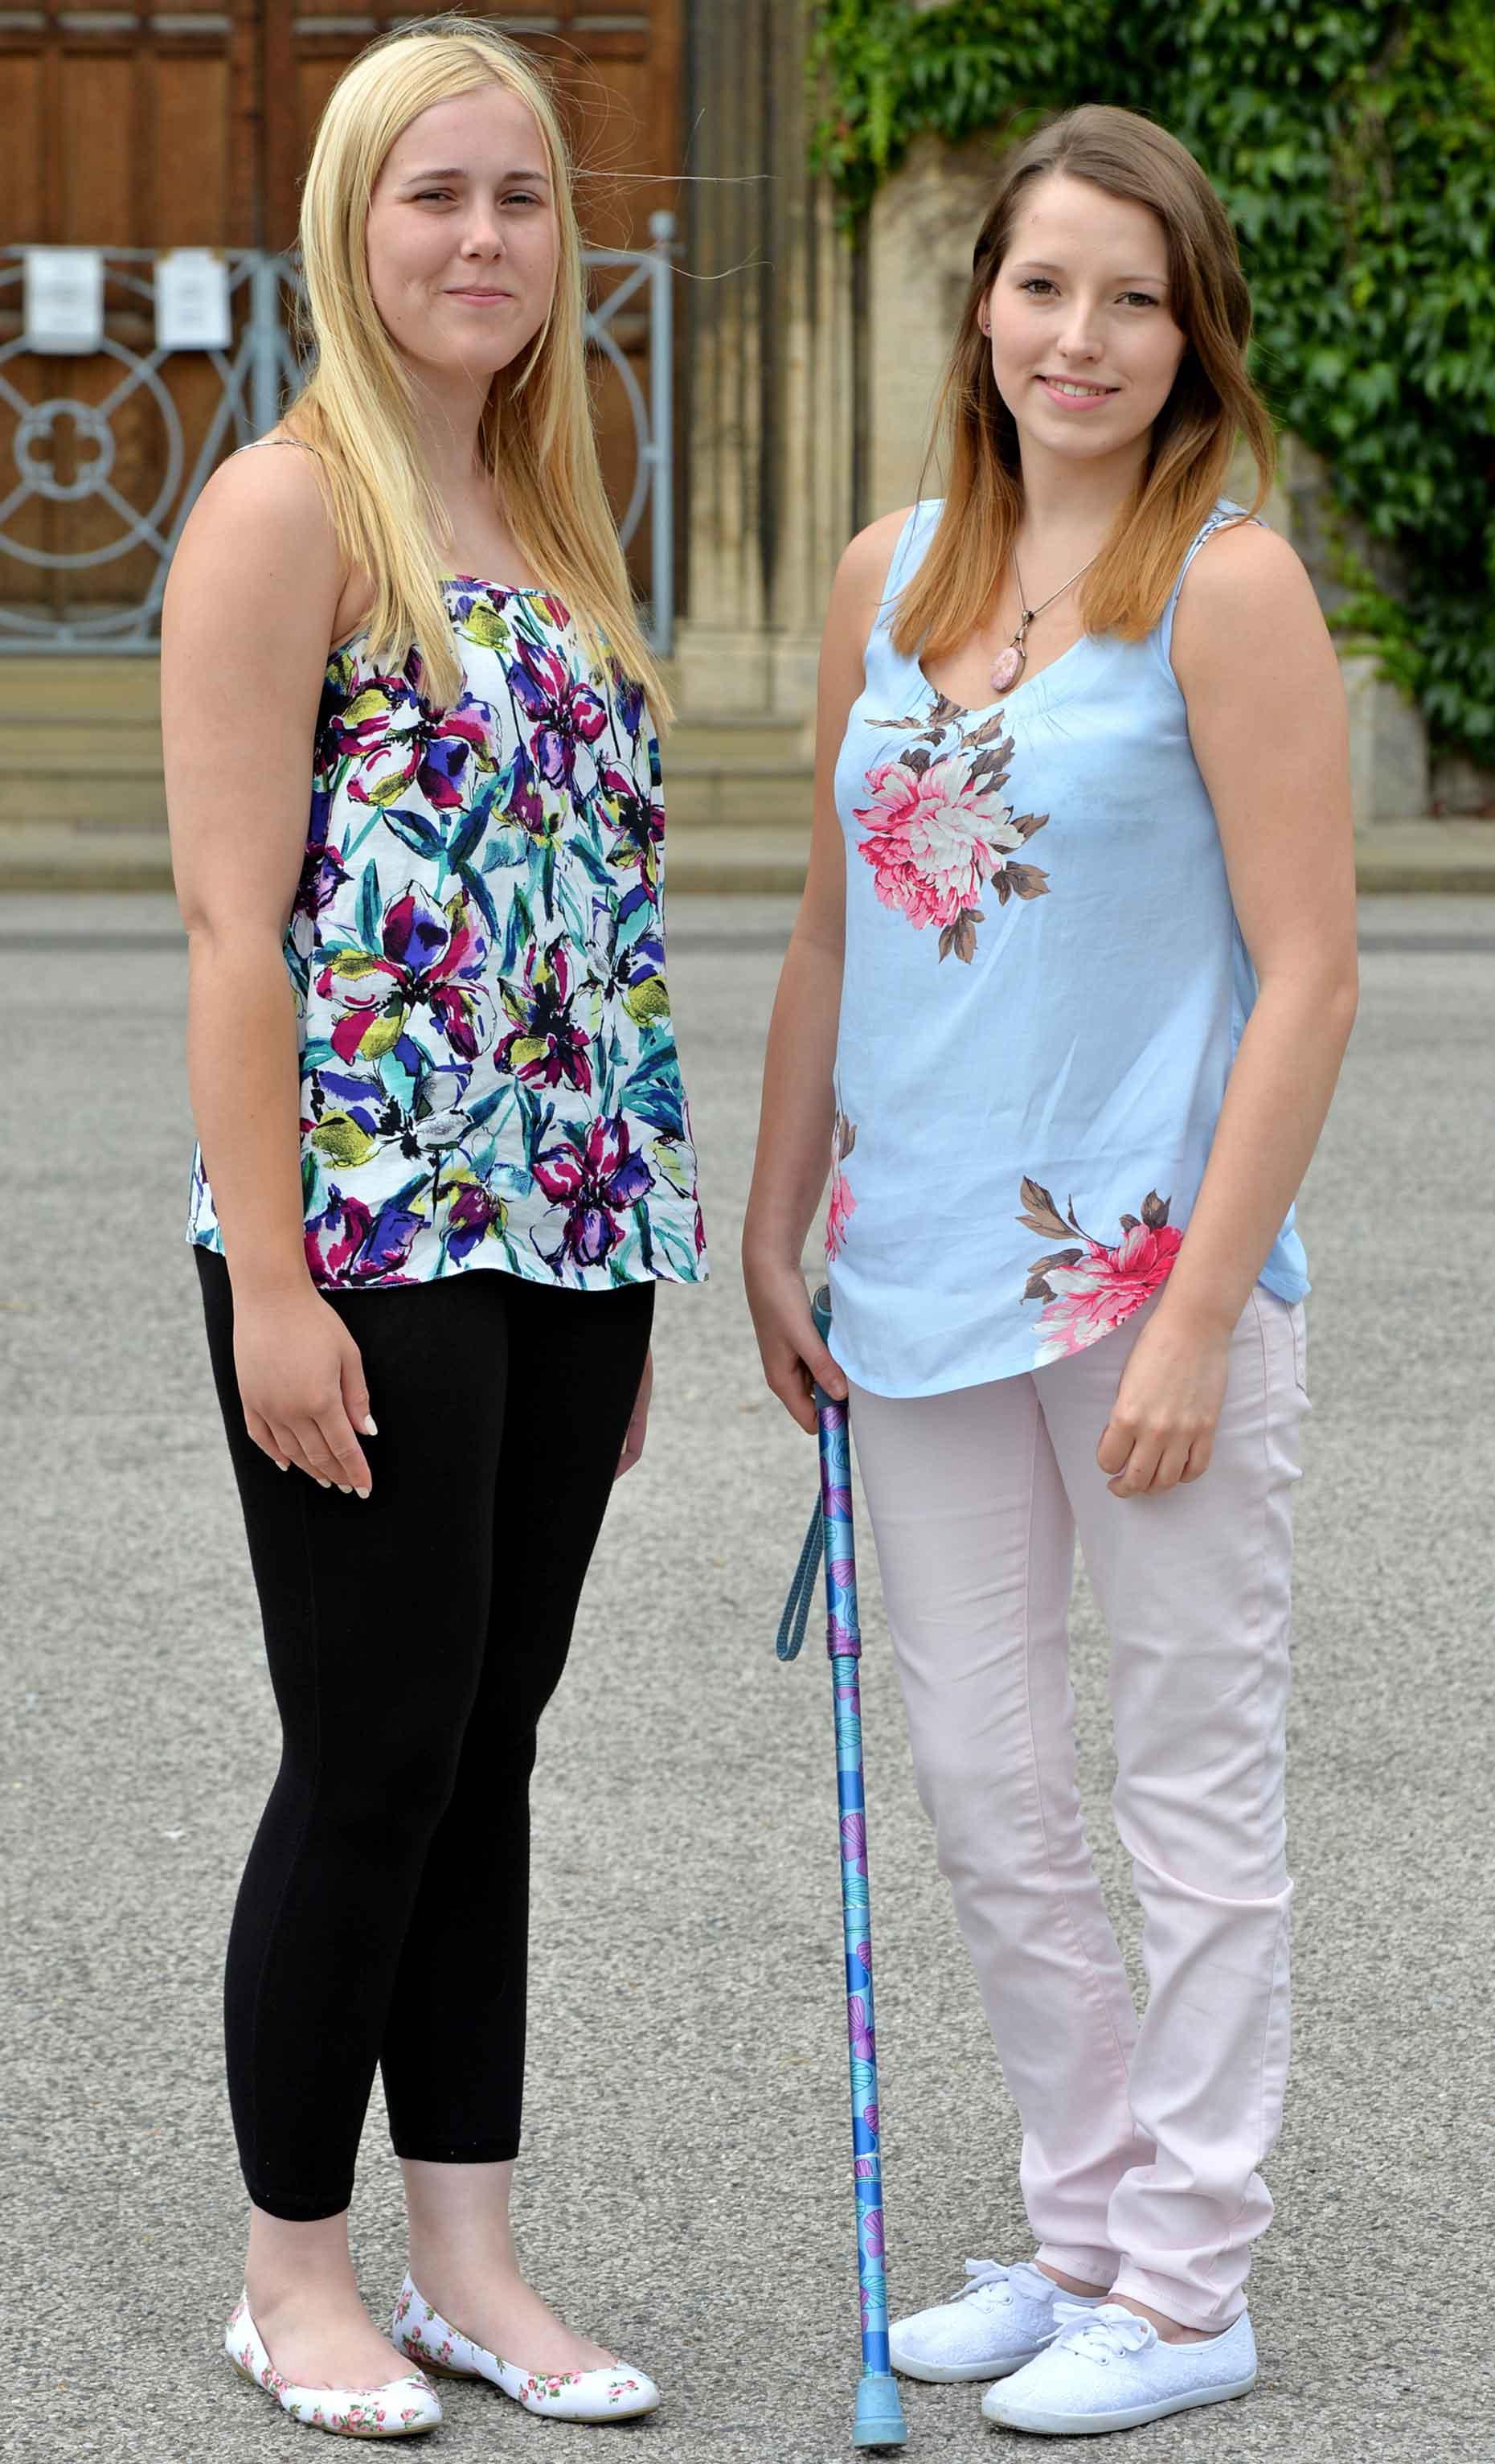 Kate Hunter (left) and Beth Dyson (right) Photo: John Aron